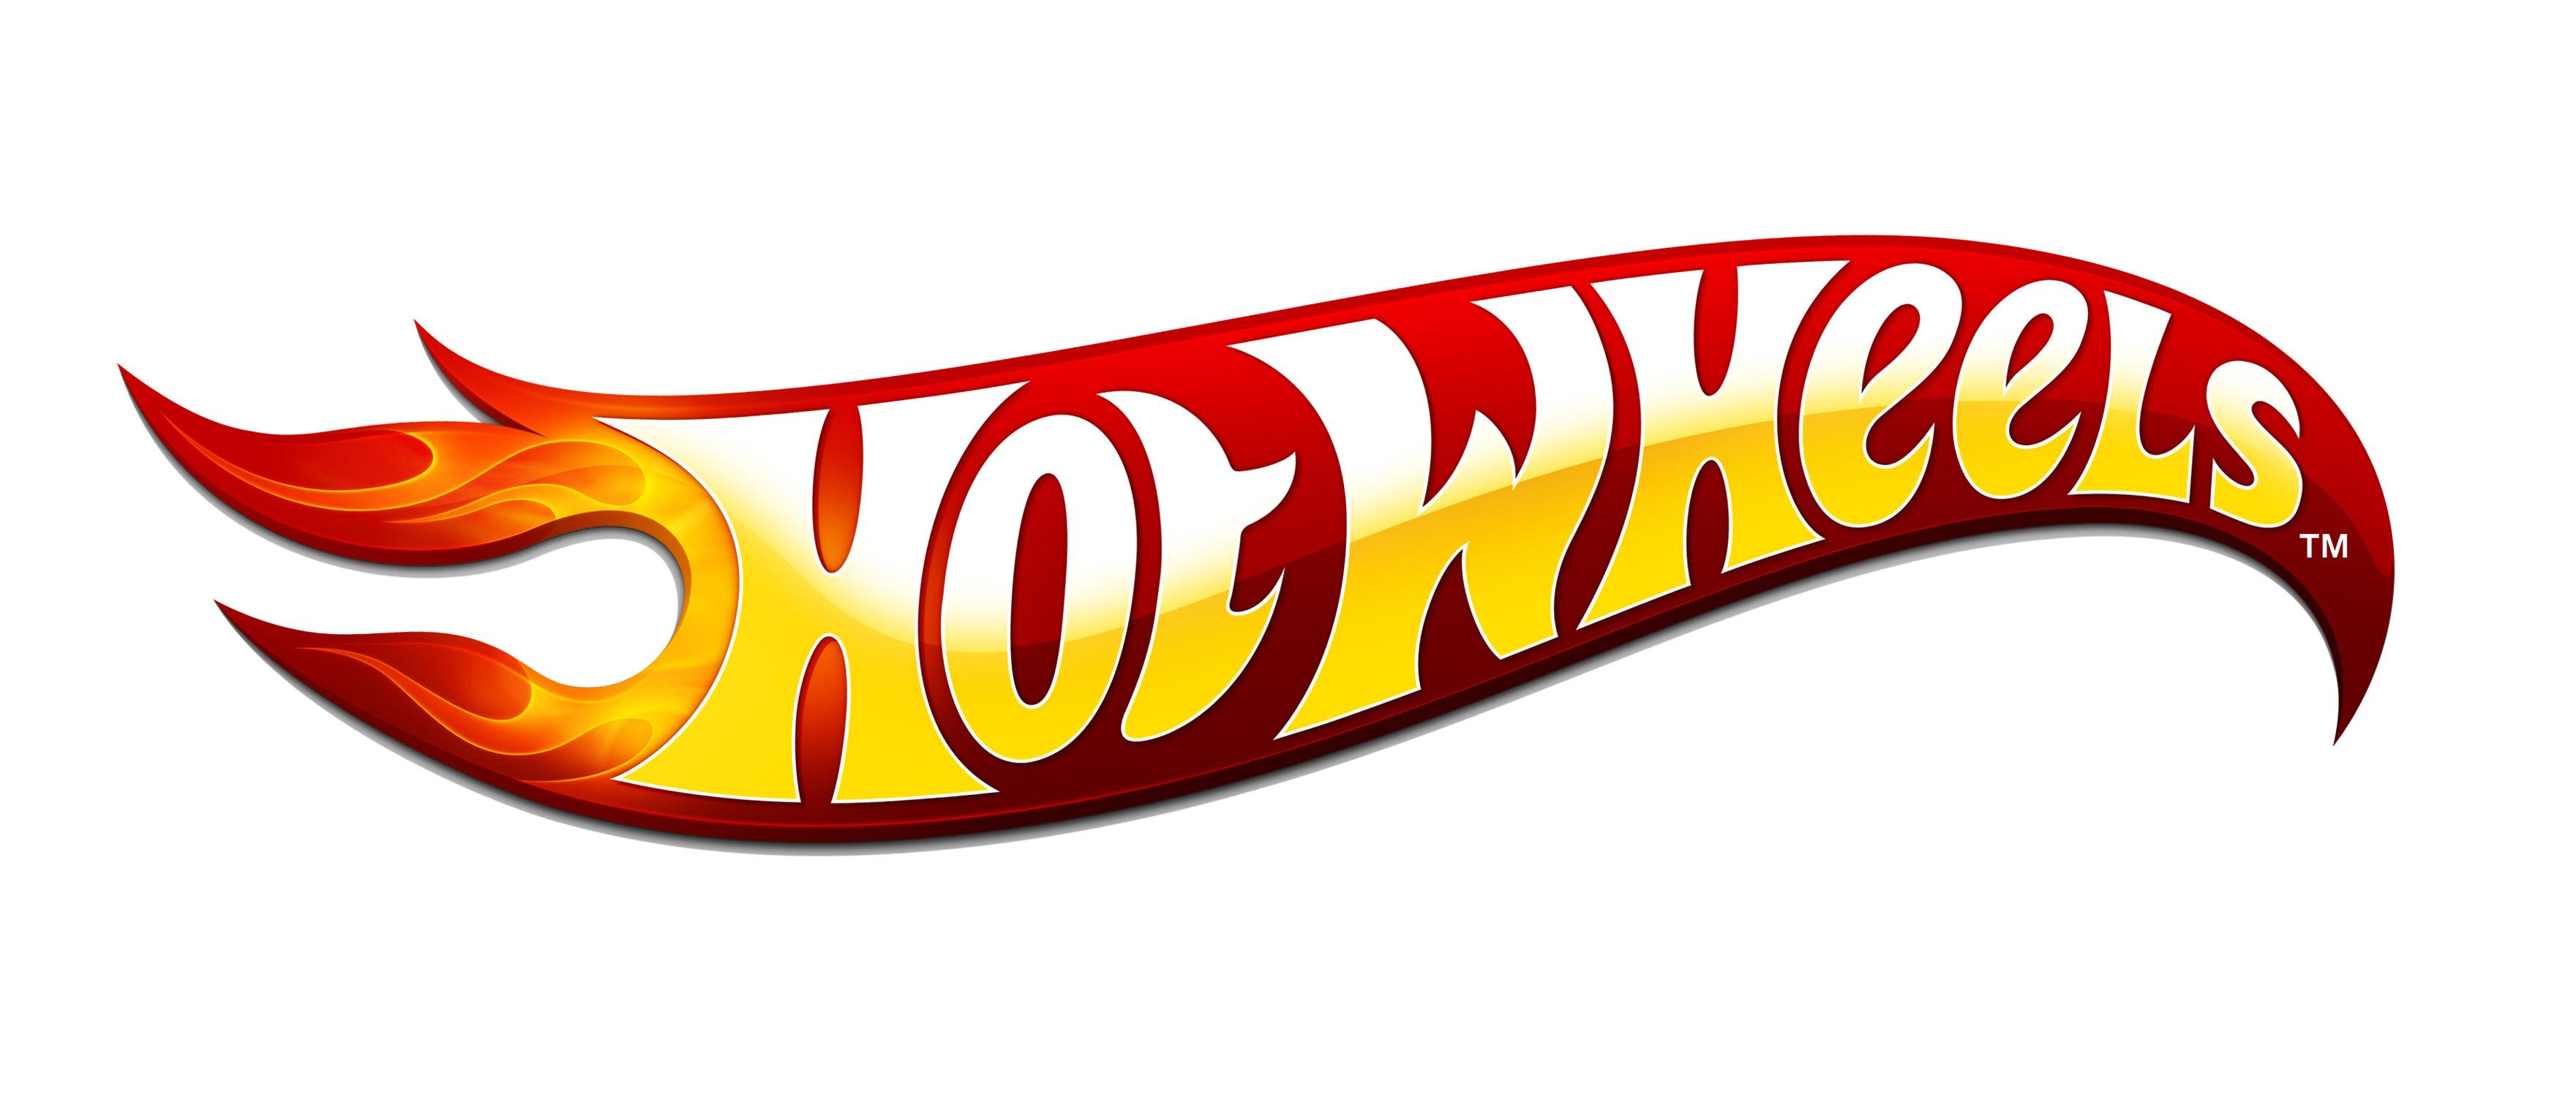 Hot Wheels Logo Wallpaper